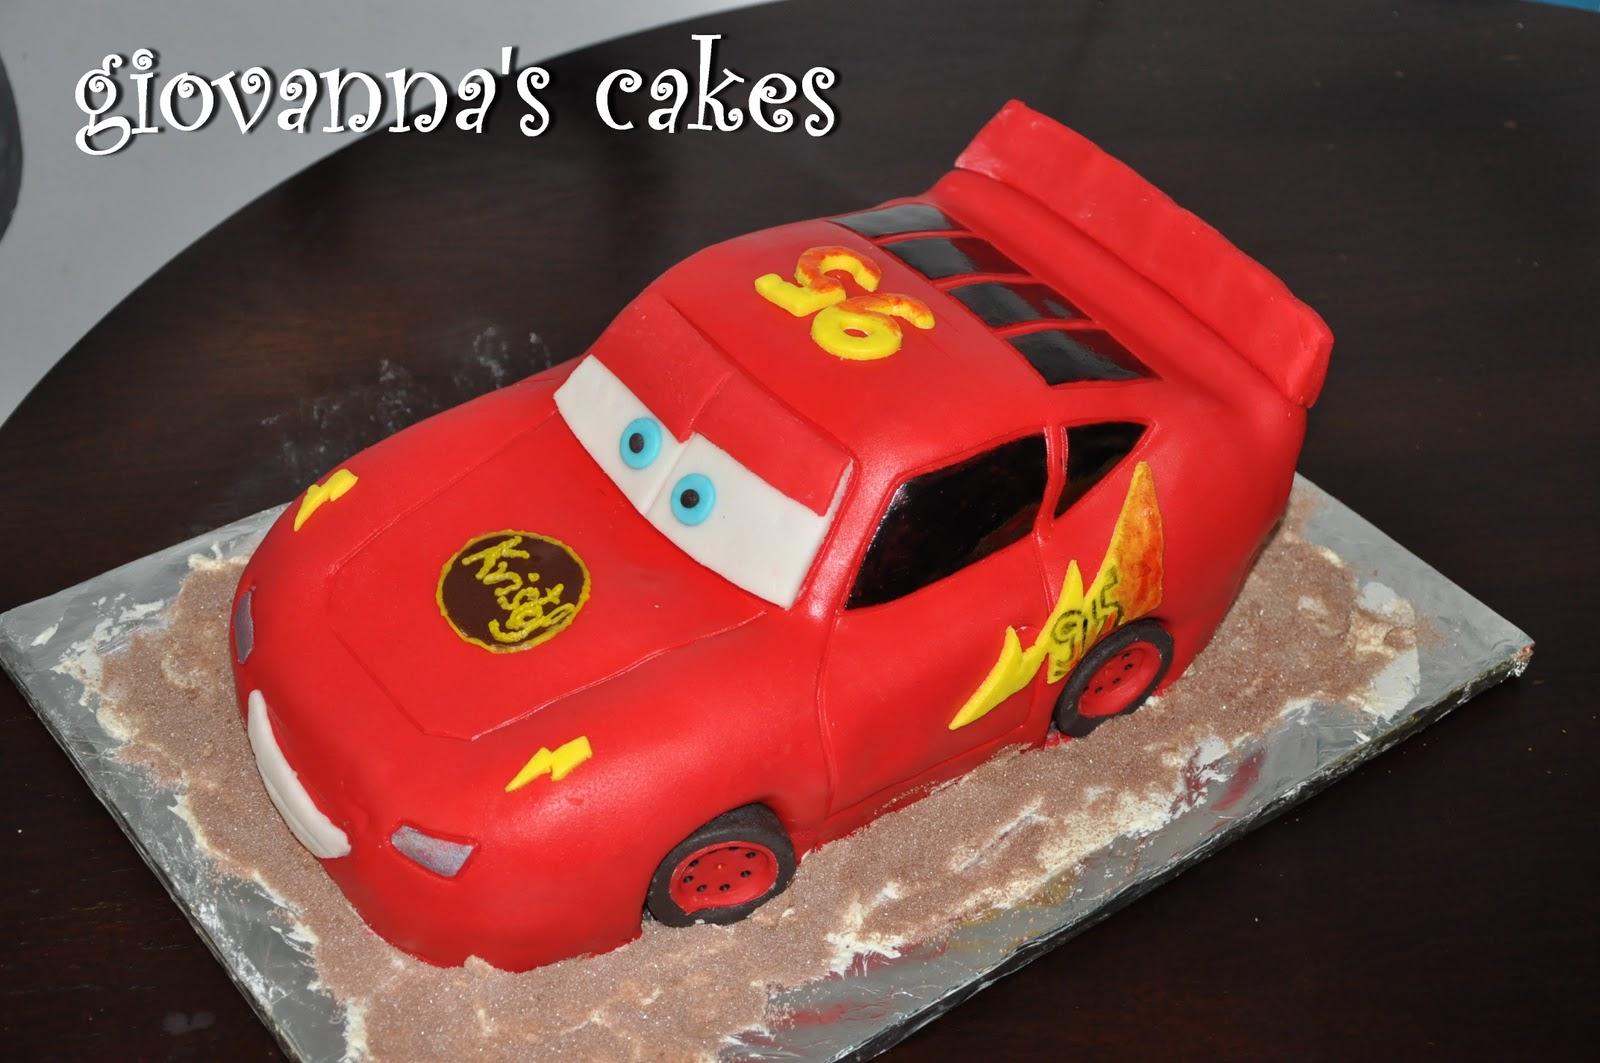 giovannas cakes Lightning Mcqueen cake